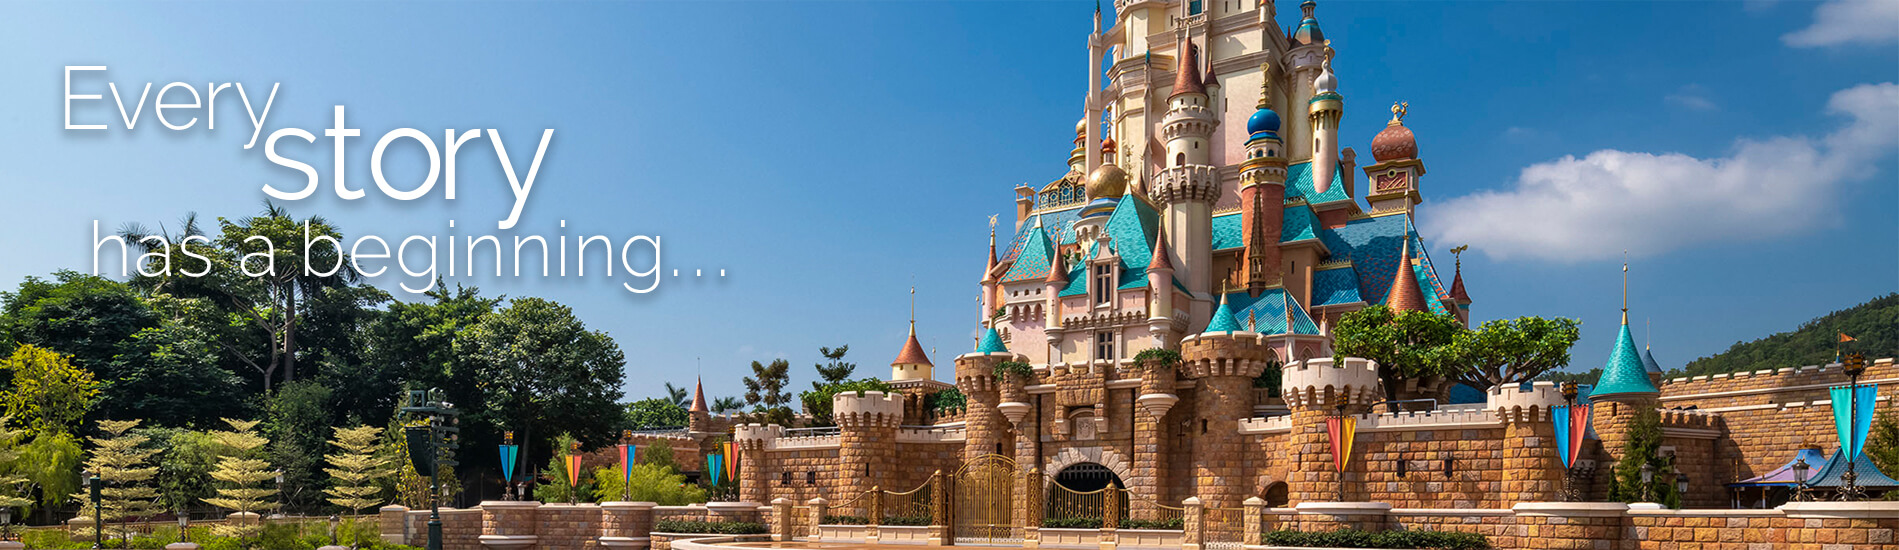 Every Story has a Beginning Walt Disney World castle